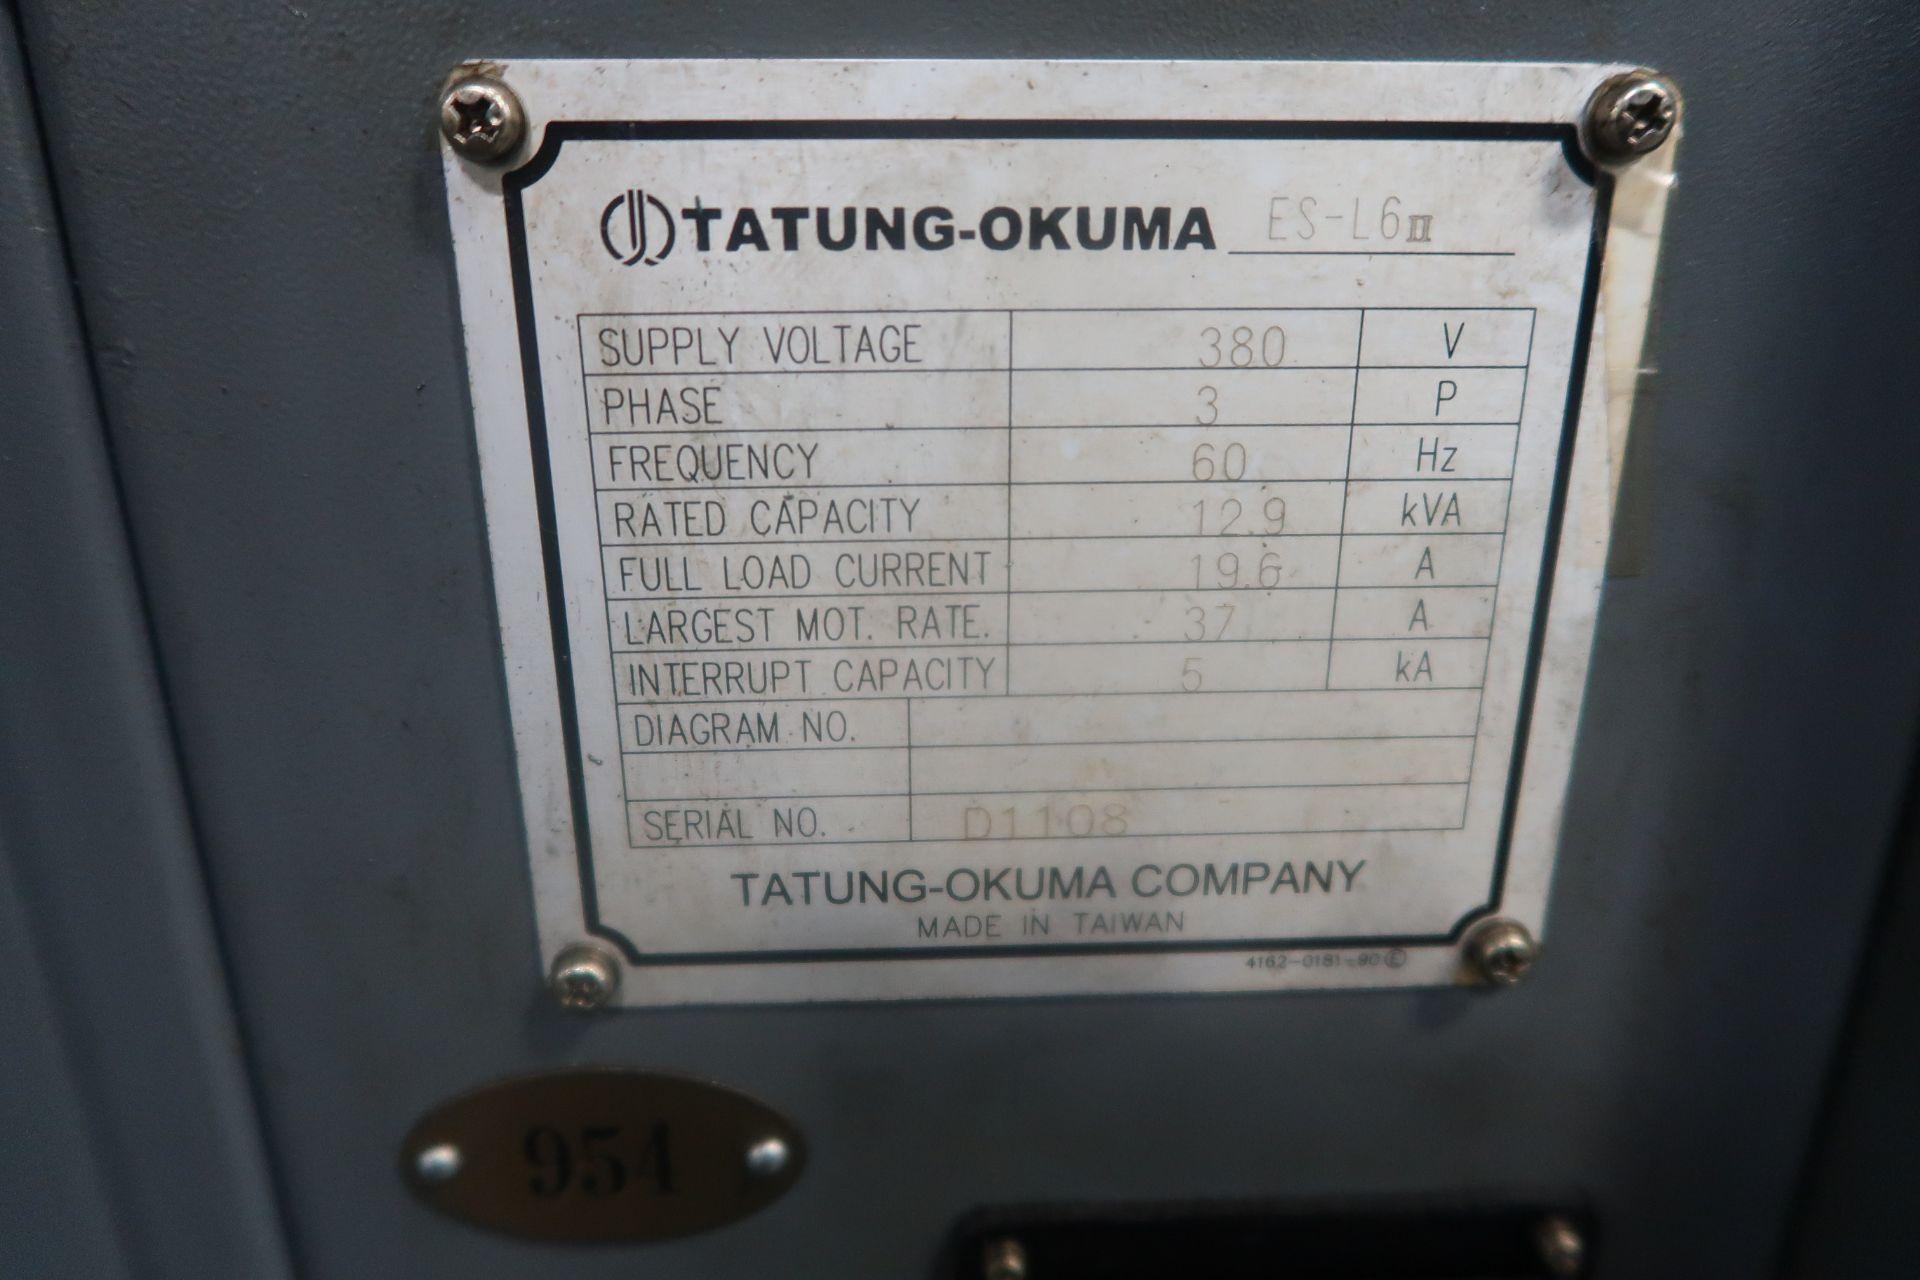 Lot 16A - Okuma Heritage ES-L6II CNC 2-Axis Turning Center Lathe, S/N D1108 New 2006